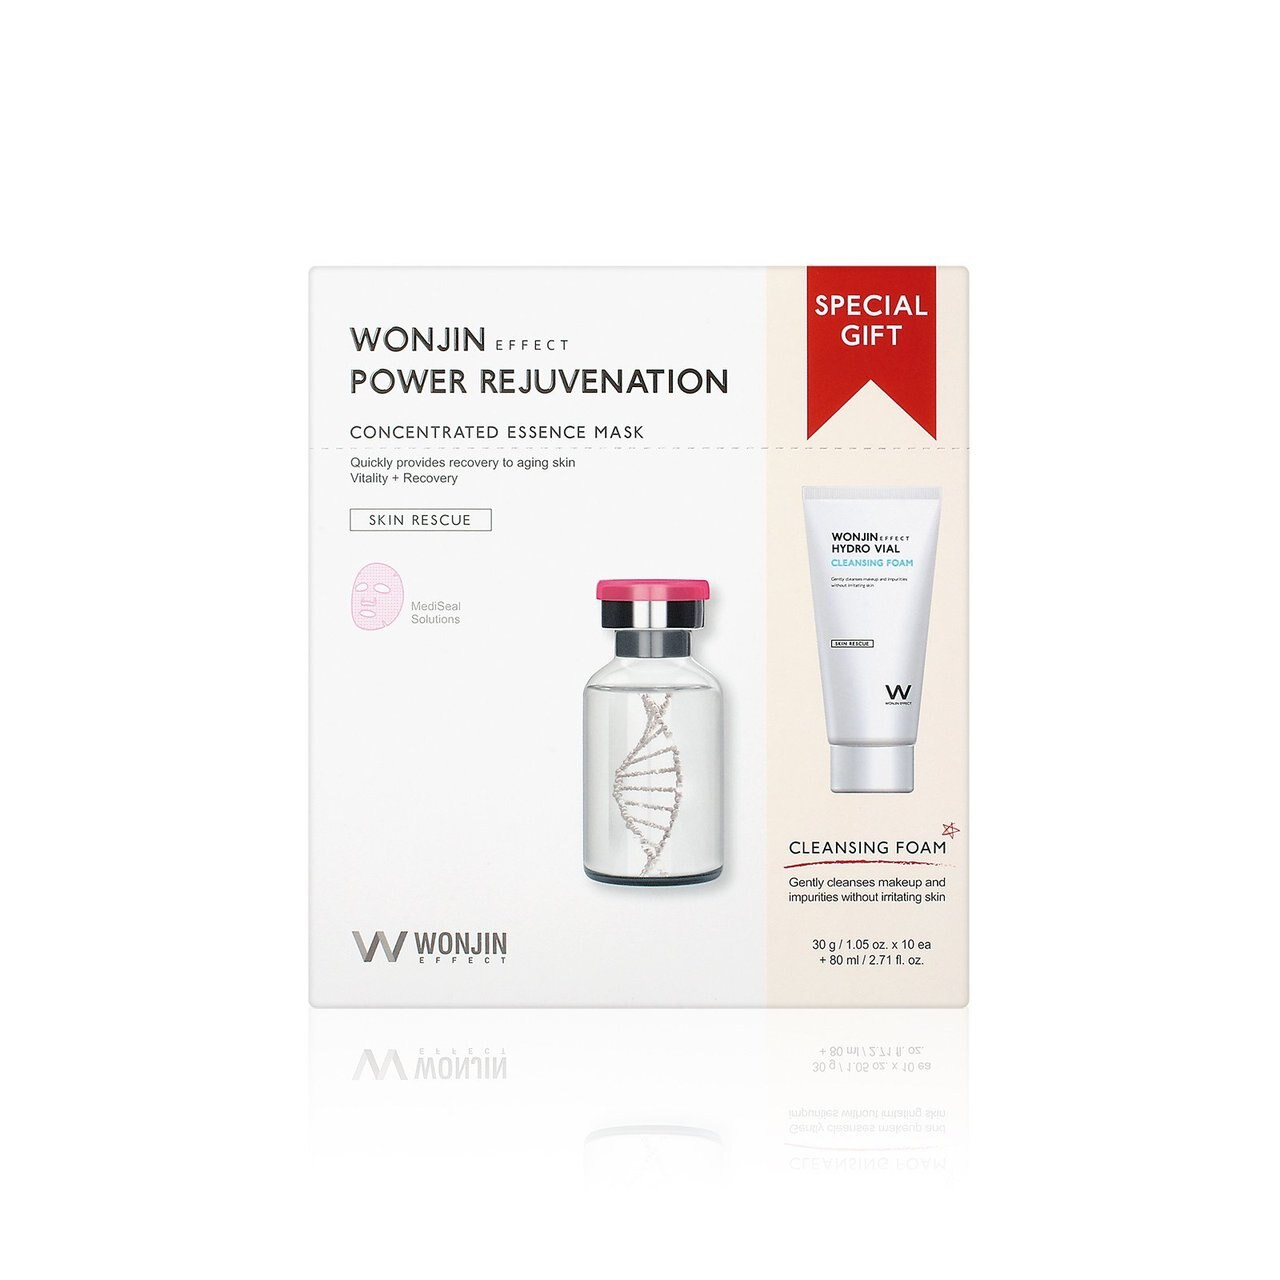 Wonjin Effect Power Rejuvenation Concentrated Essence Mask & Cleansing Special Kit